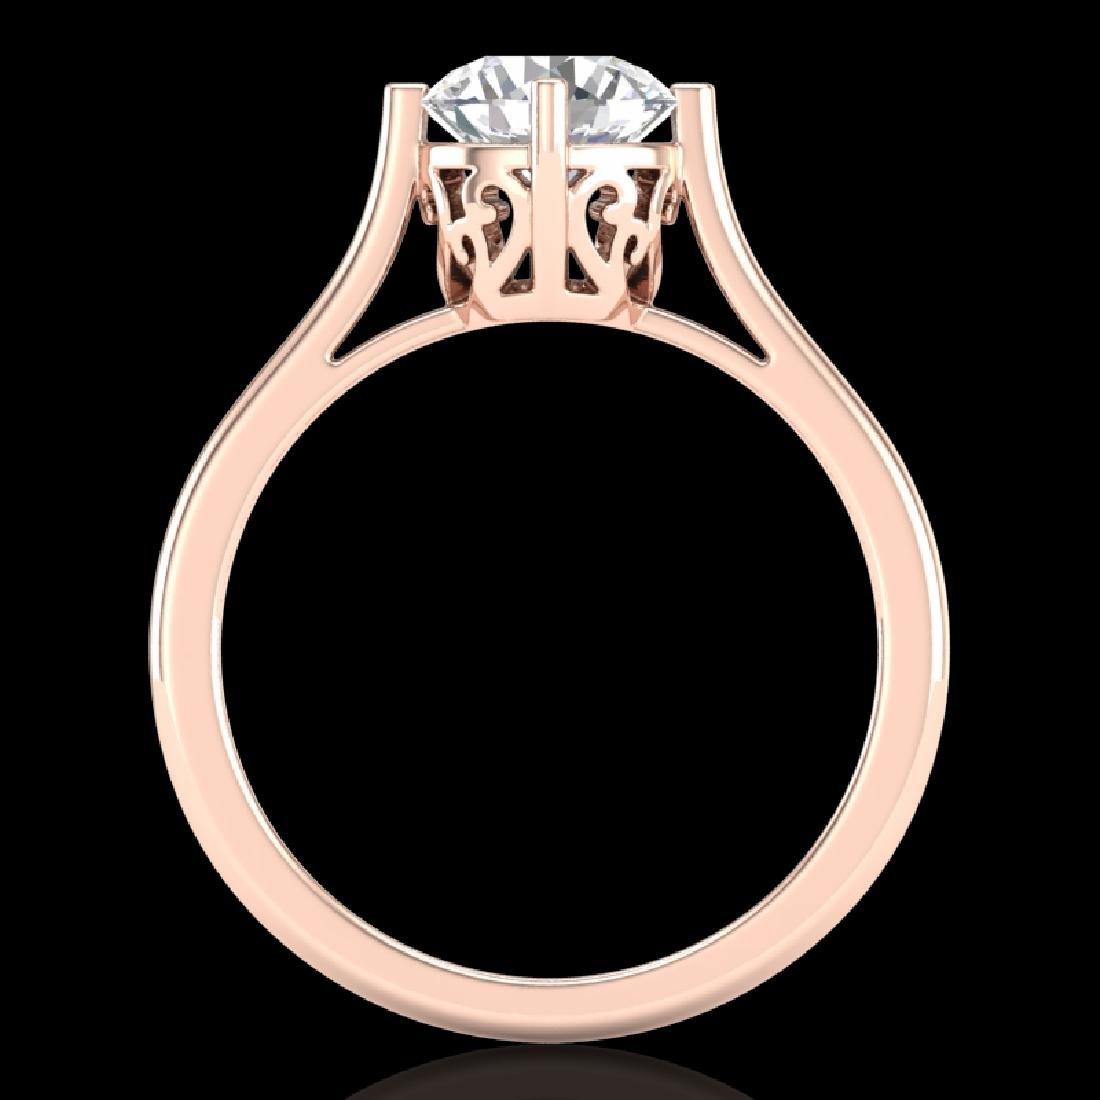 1.25 CTW VS/SI Diamond Solitaire Art Deco Ring 18K Rose - 3